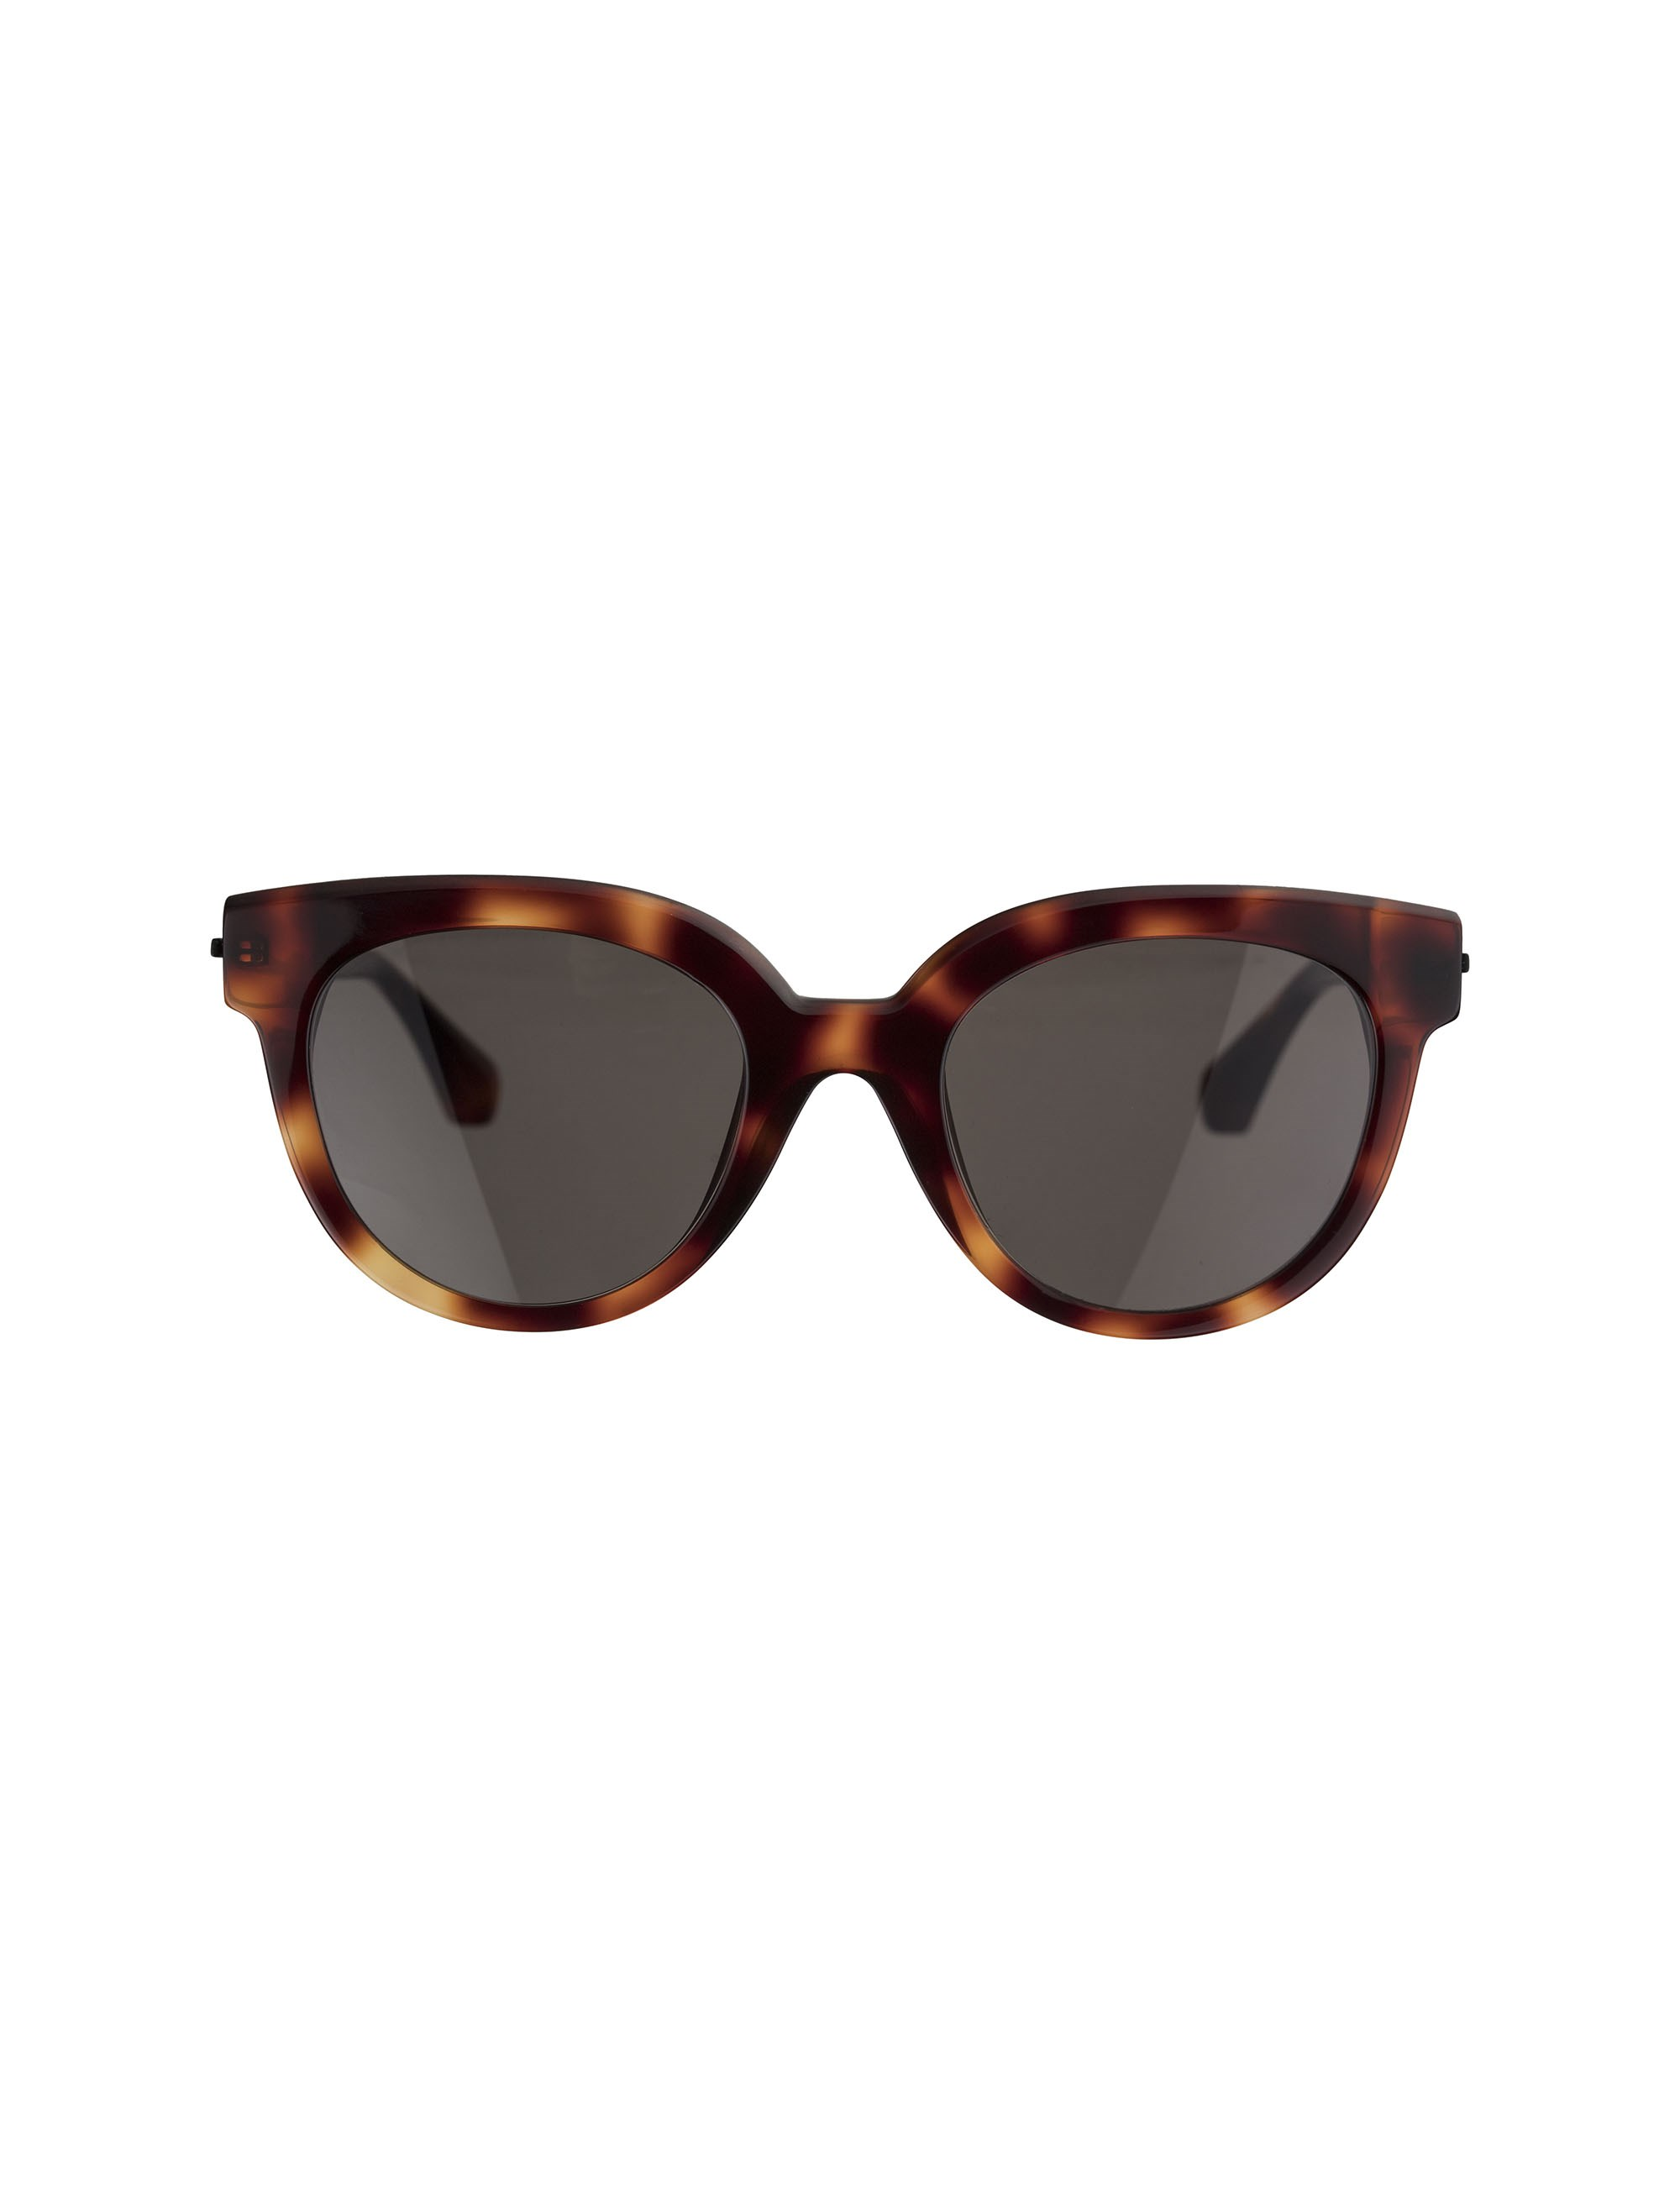 قیمت عینک آفتابی پنتوس زنانه - ساندرو